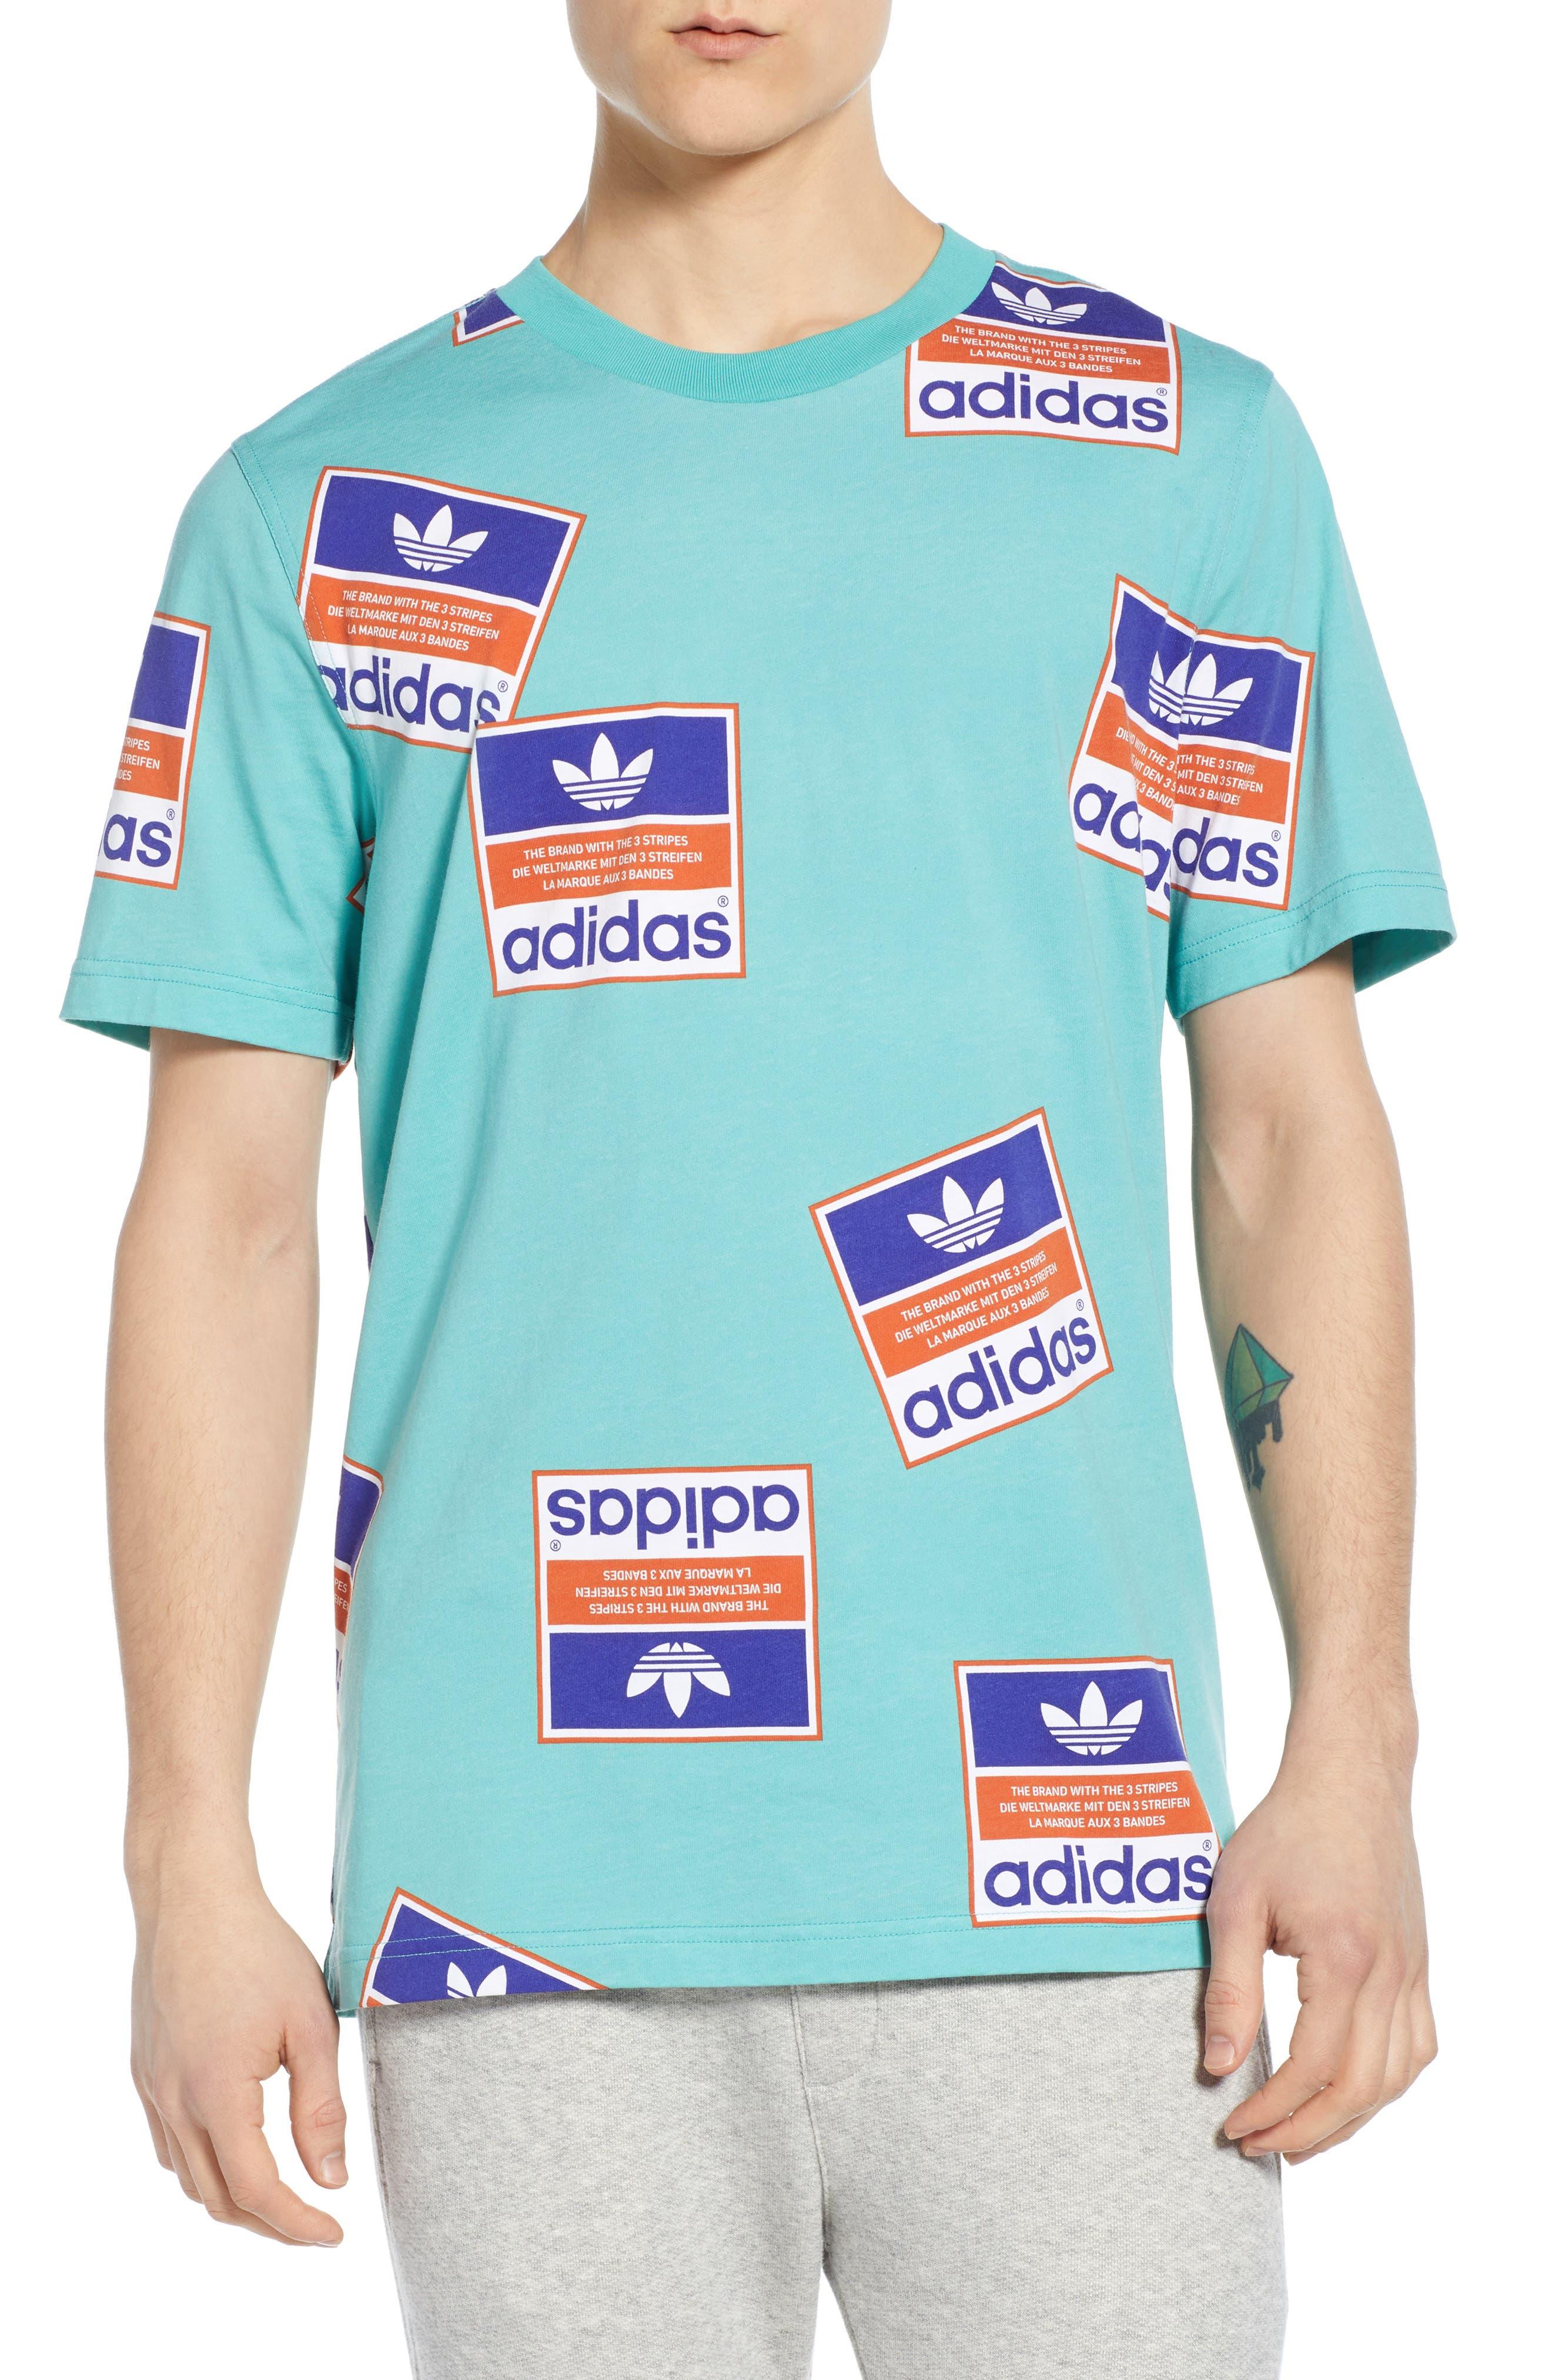 Adidas Originals Stickerbomb Graphic T-Shirt, Green